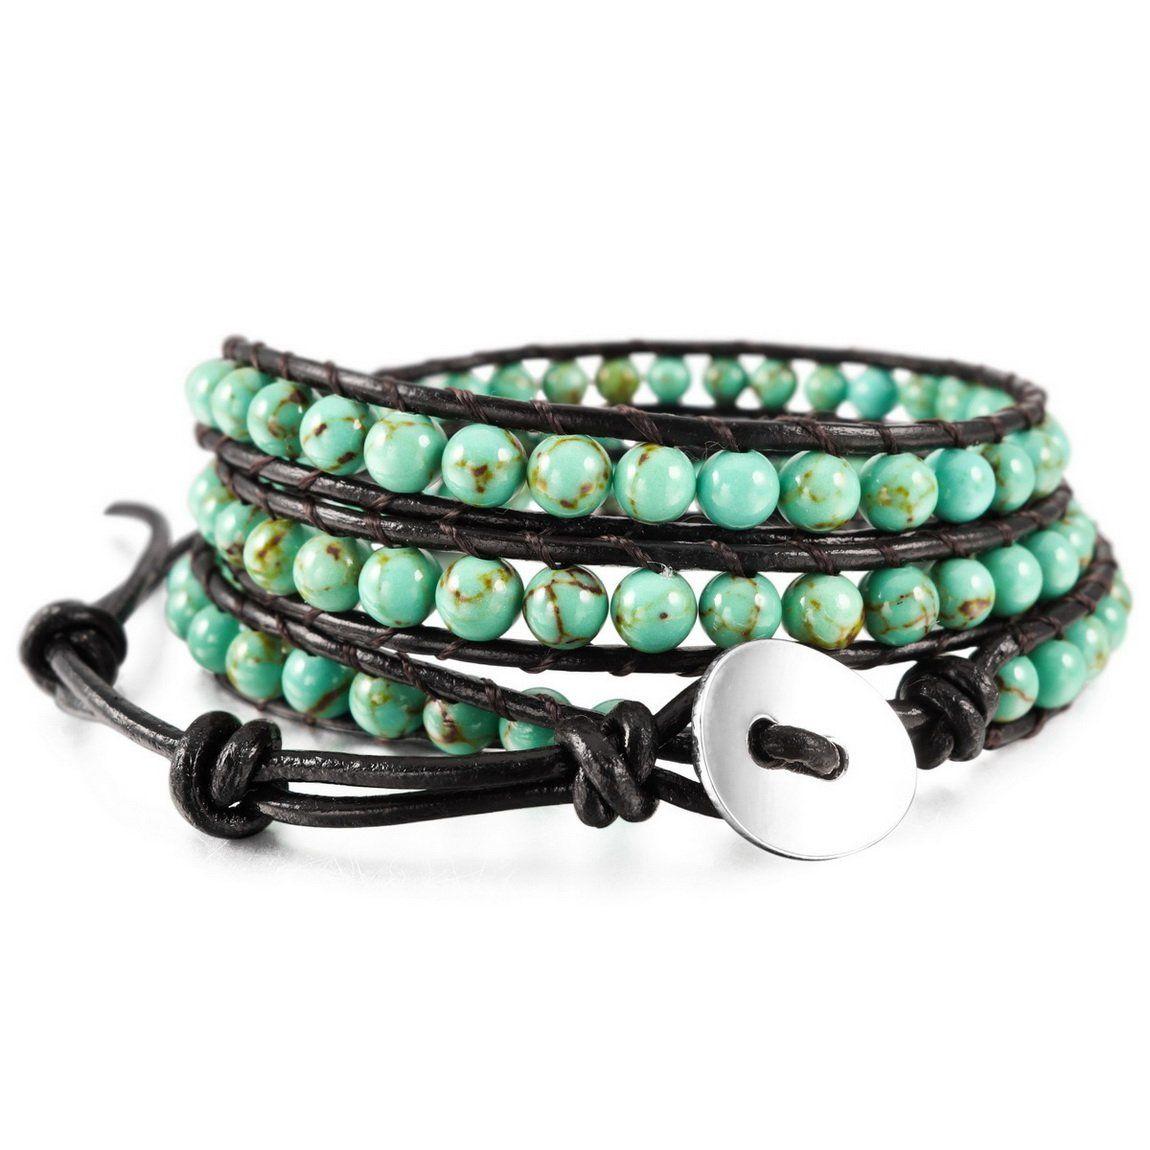 Inblue menwomenus alloy genuine leather bracelet bangle cuff rope